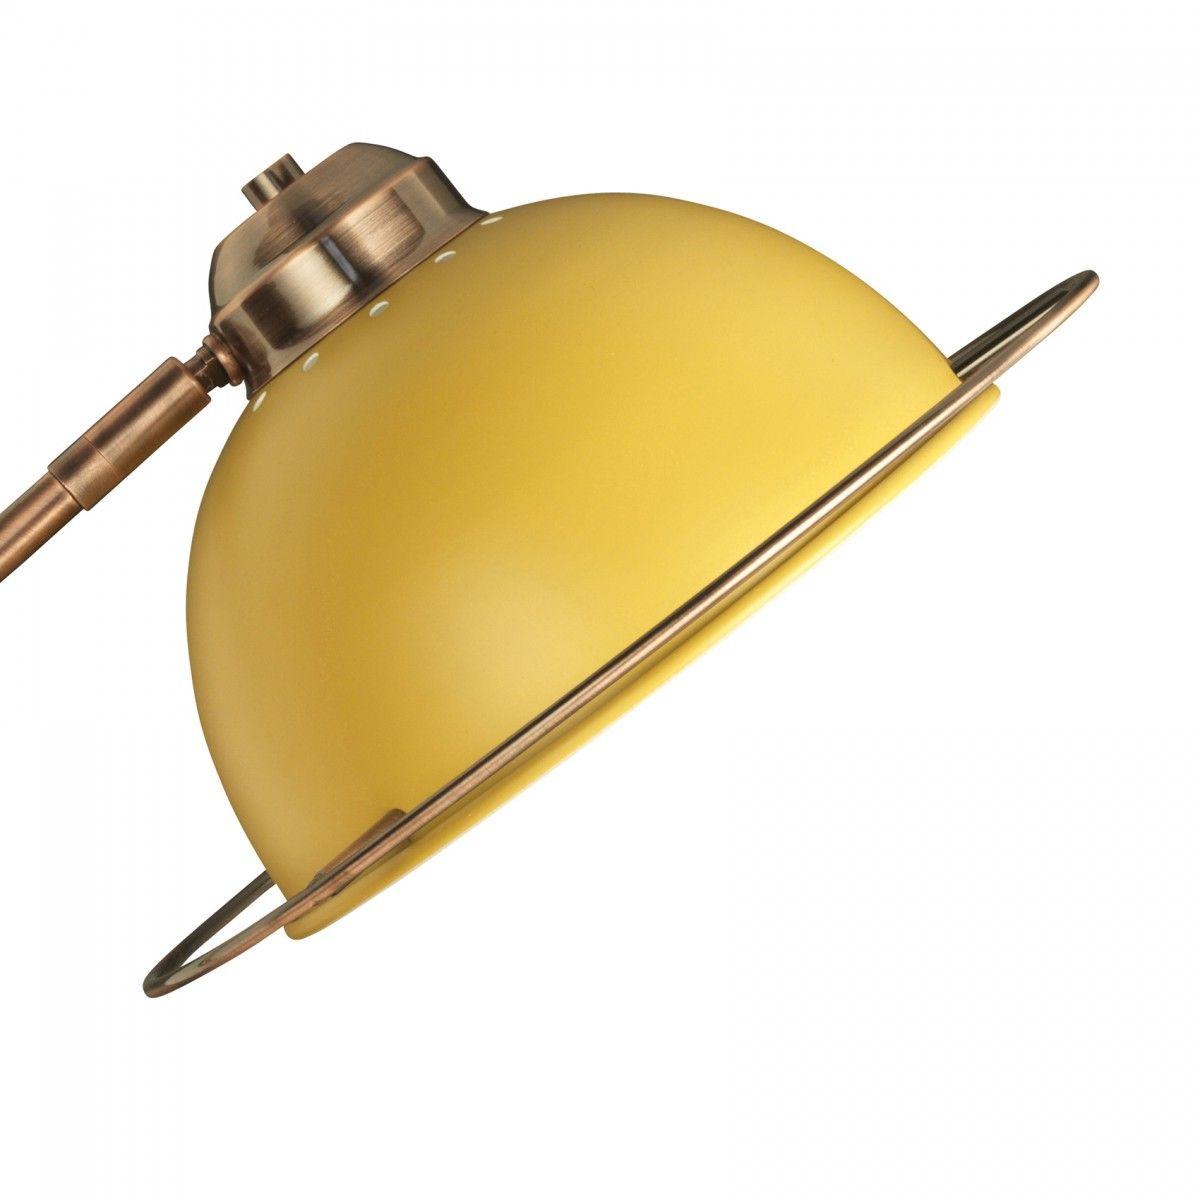 Bauhaus Adjustable Table Lamp - Ochre